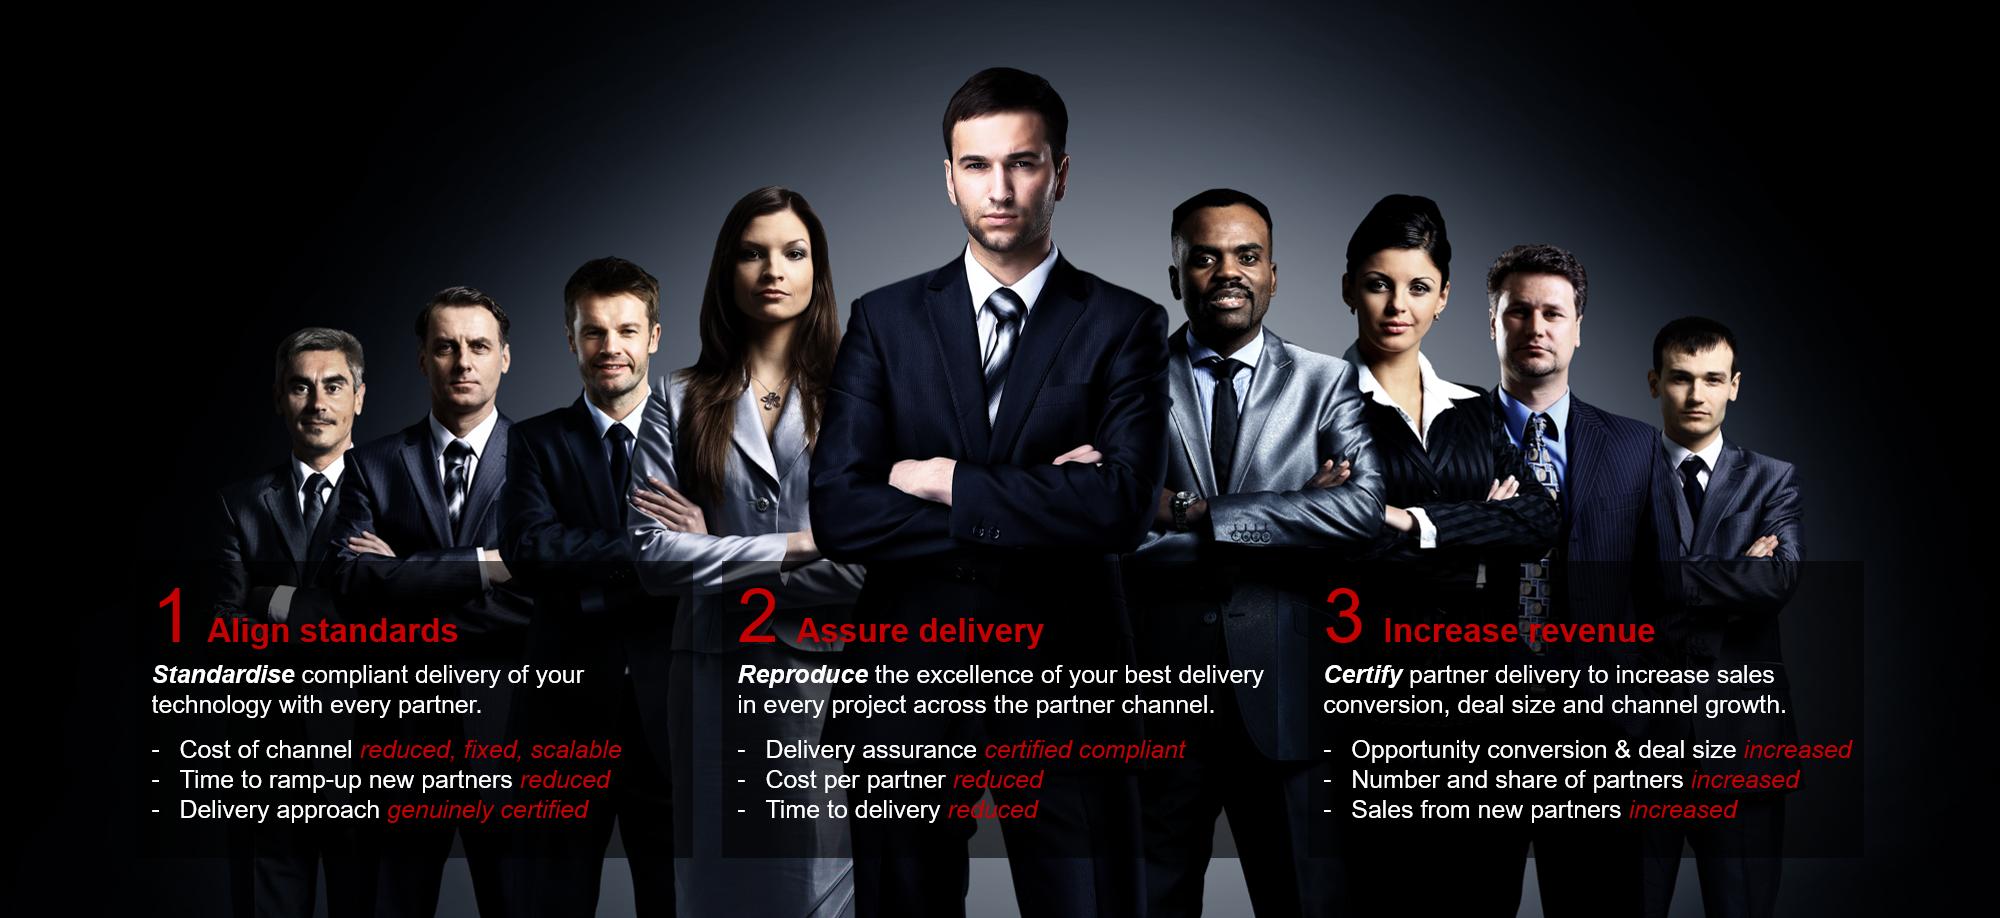 Partner Assurance Execution Management